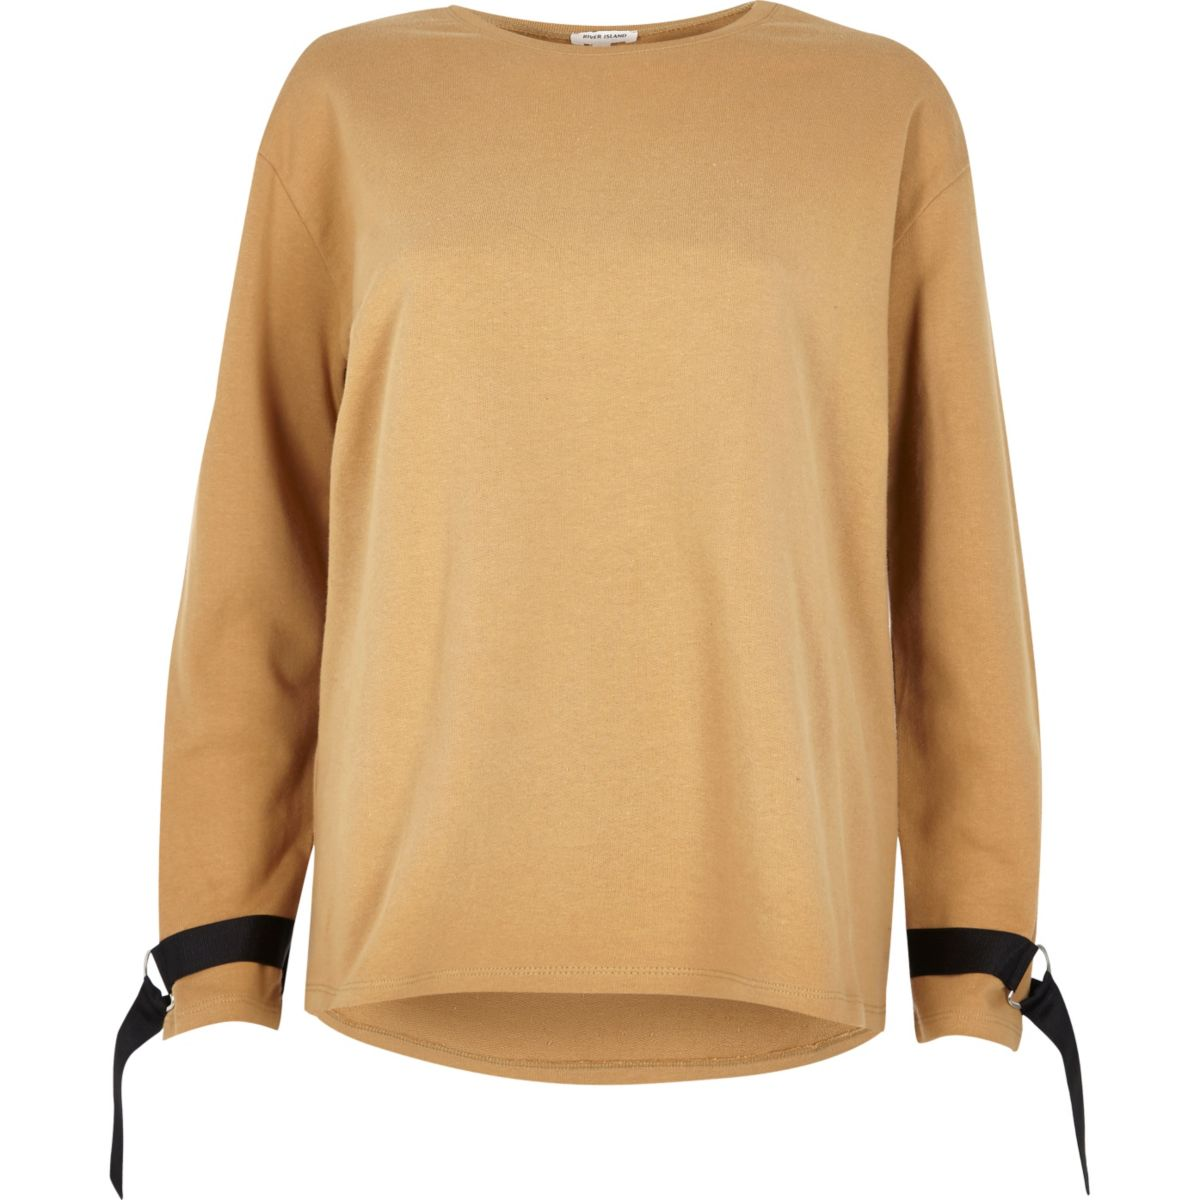 Light brown ring detail long sleeve sweater